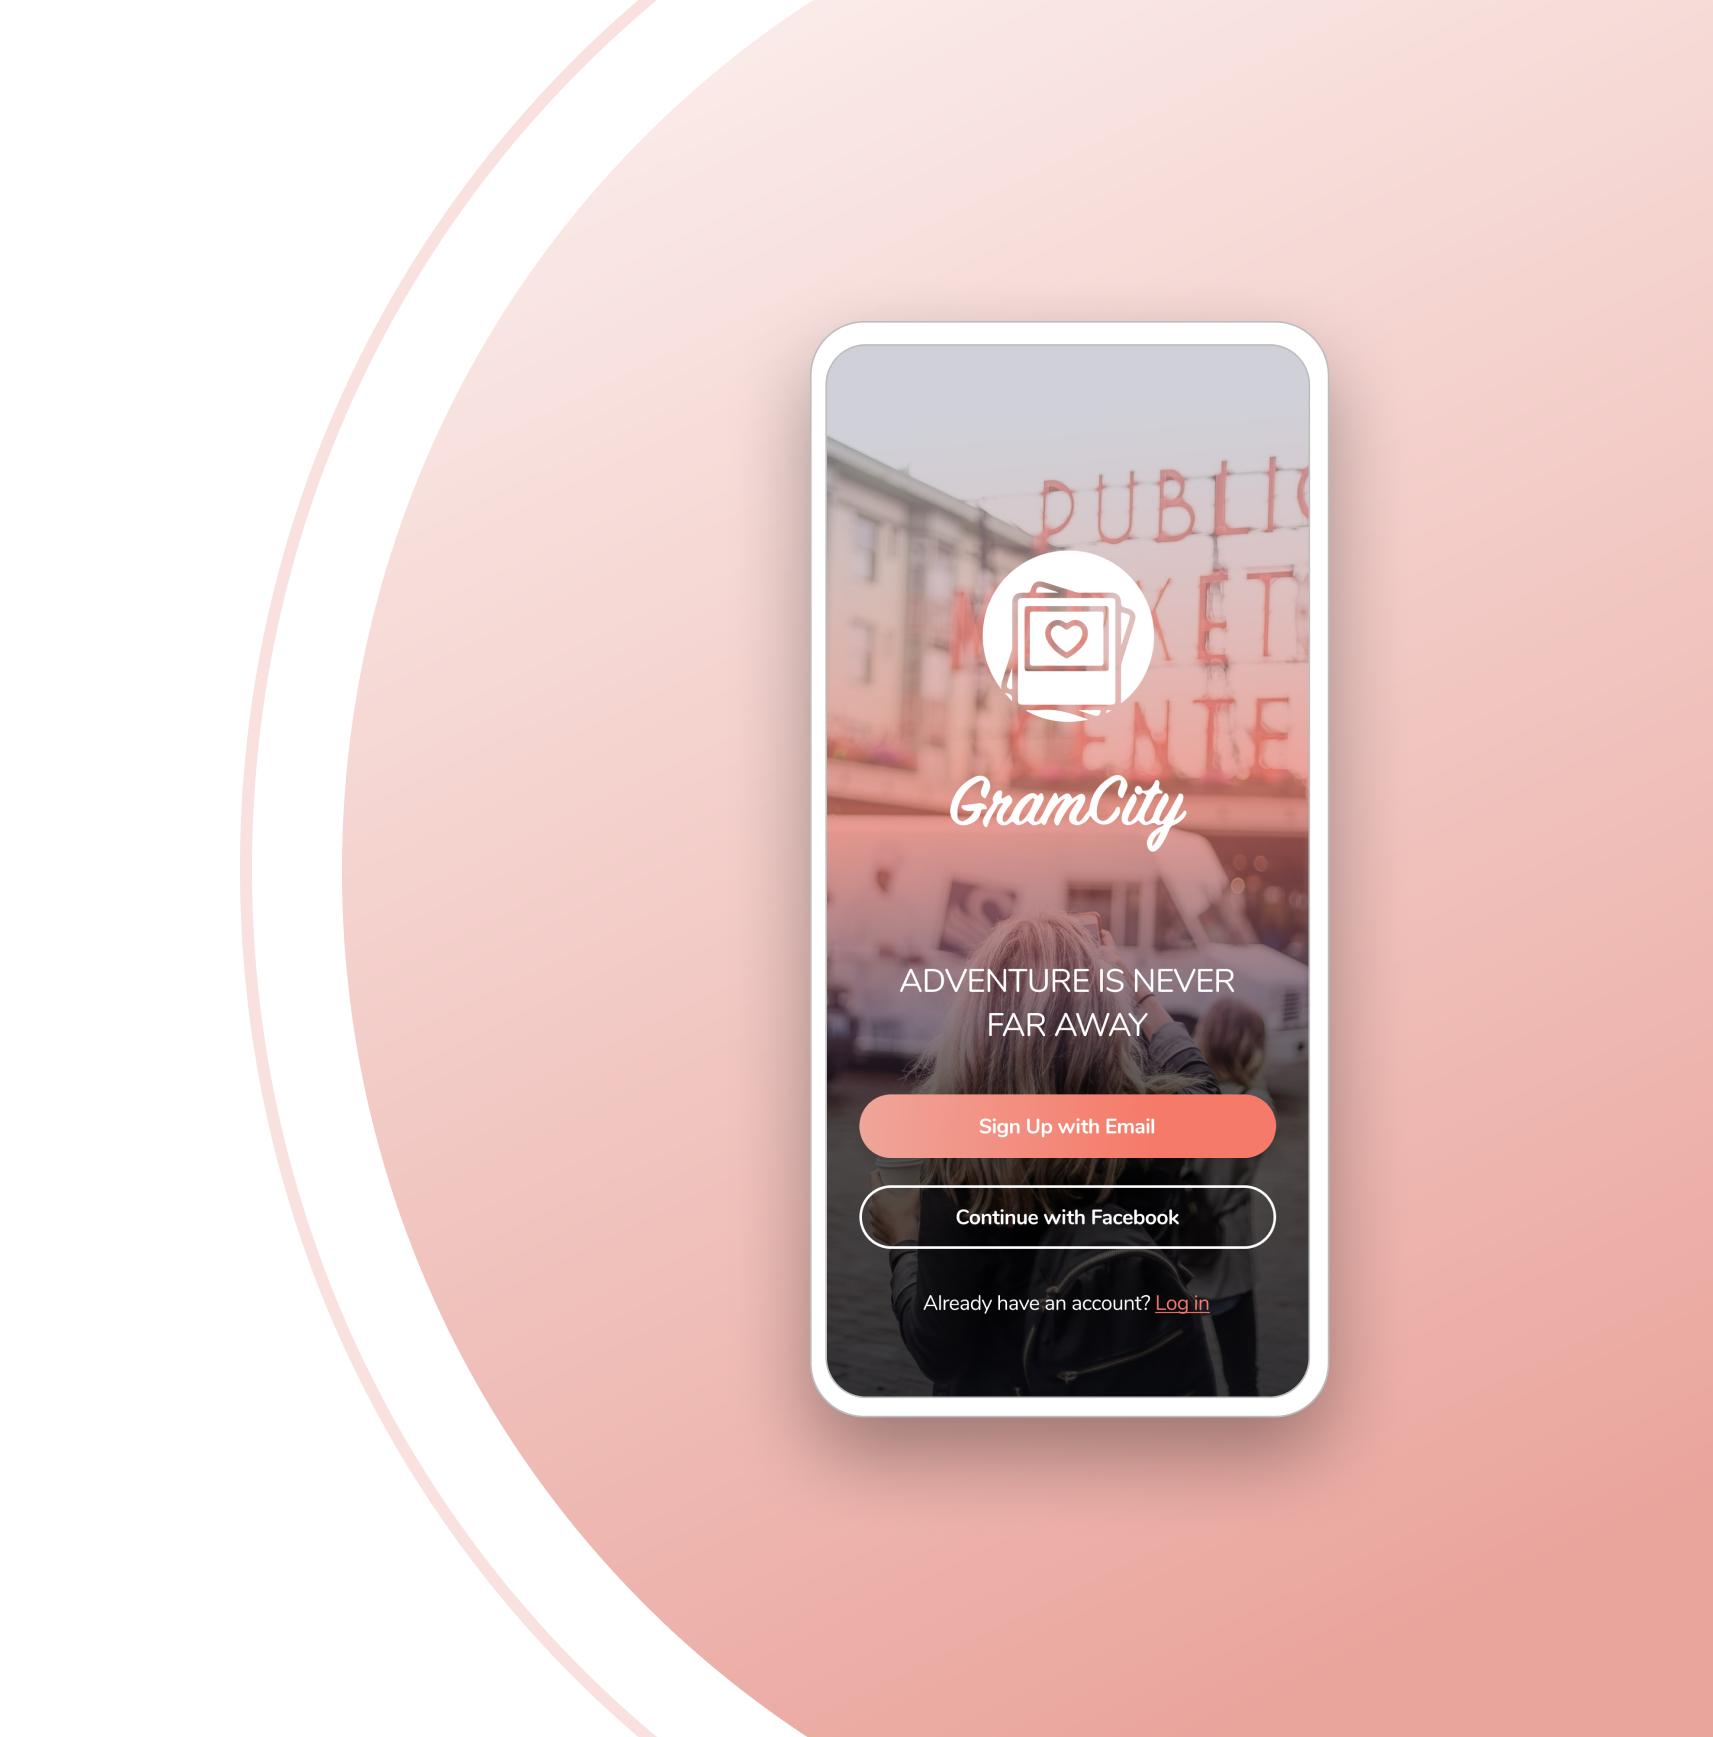 GramCity - Travel Photo Inspiration App